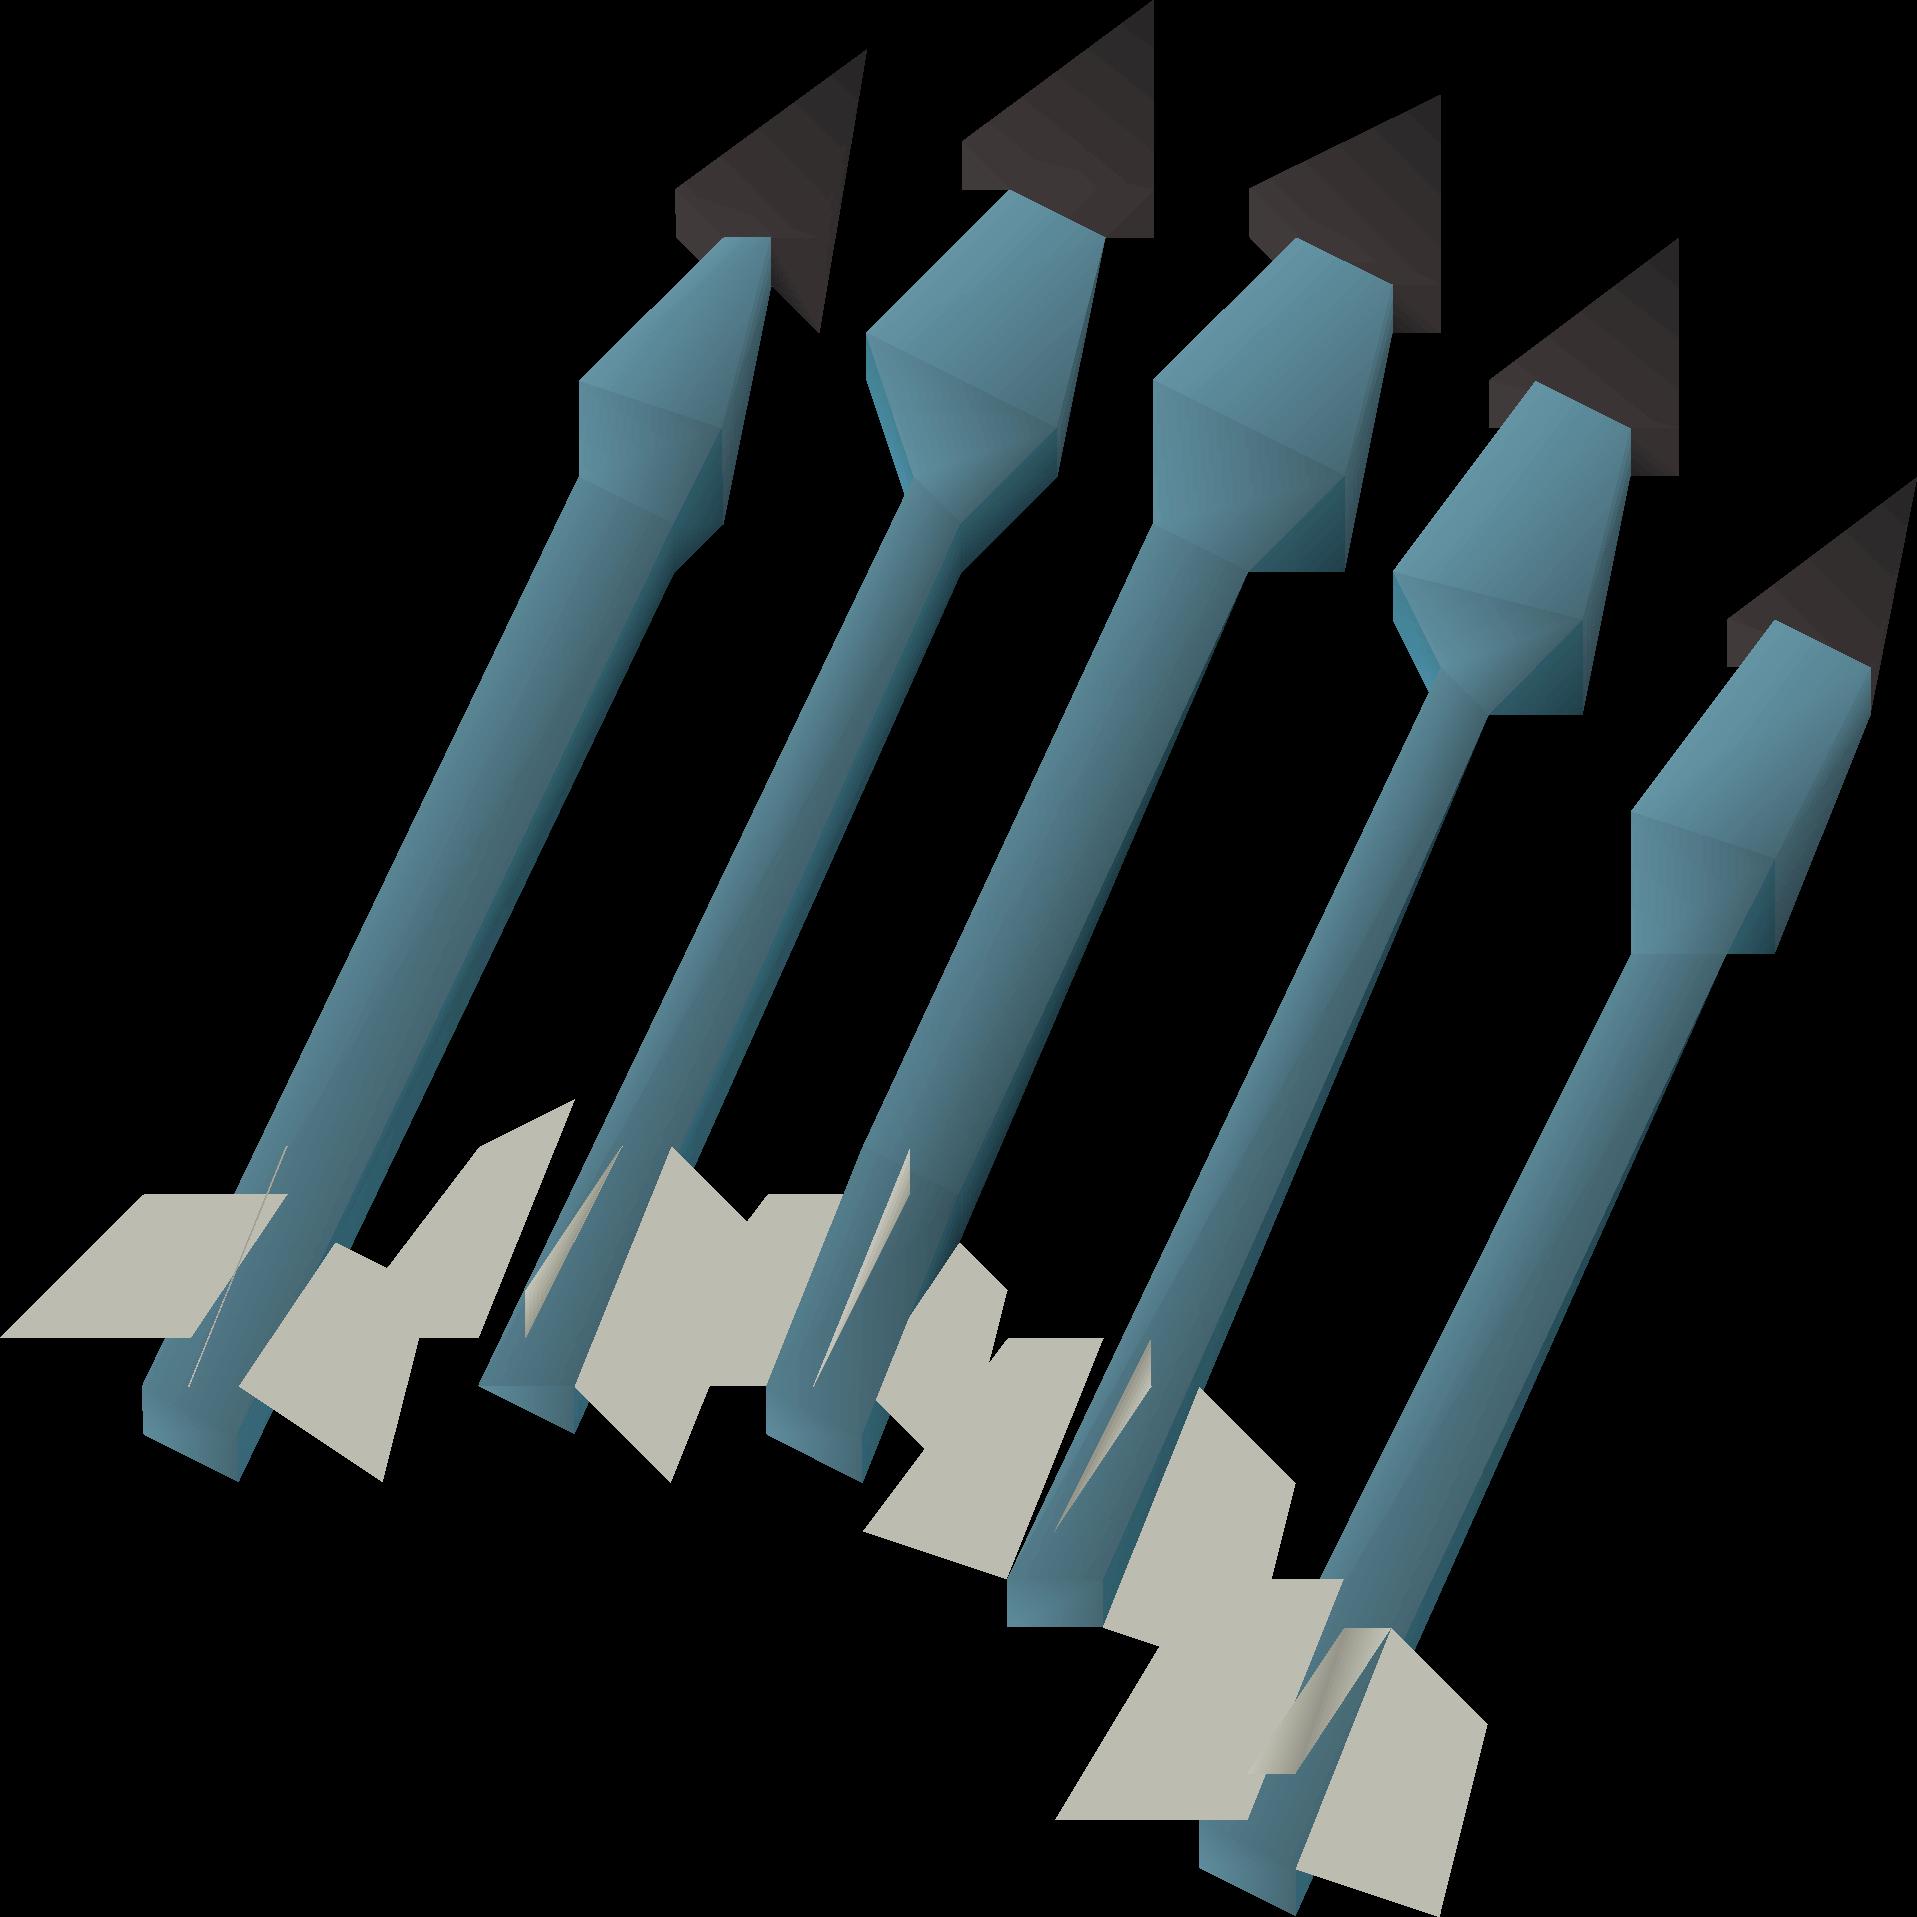 Onyx bolts (e) detail